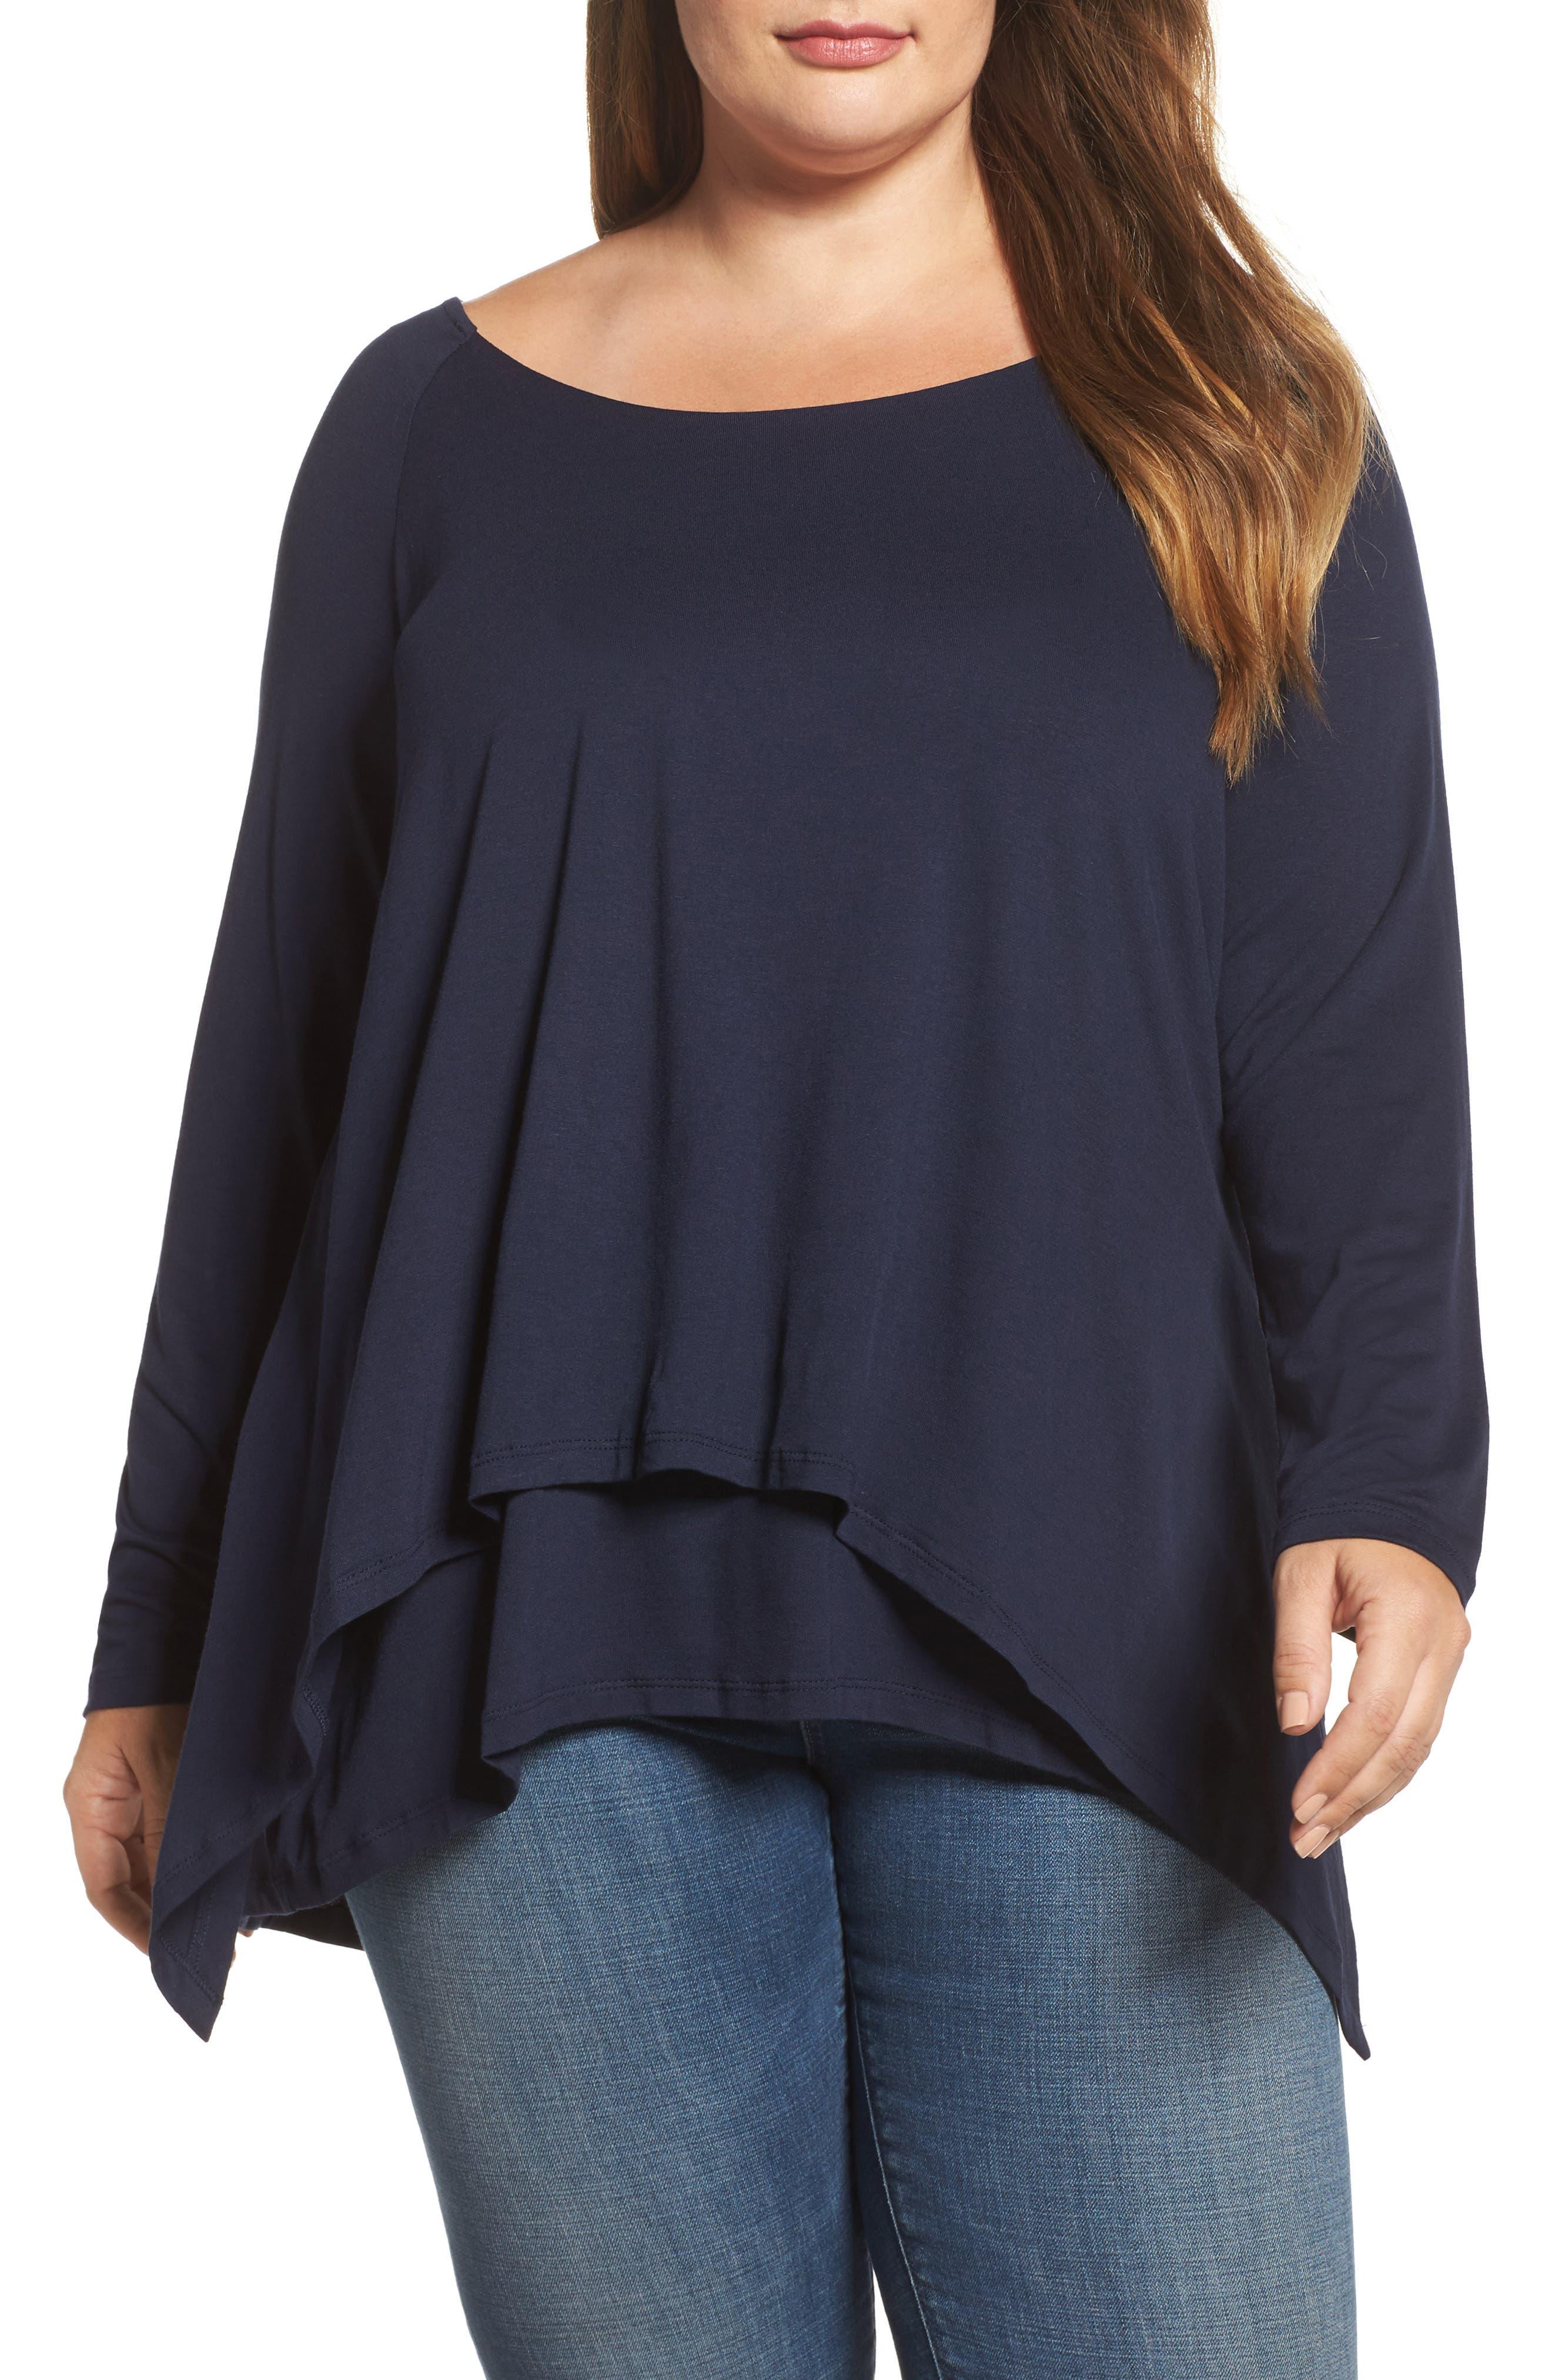 Alternate Image 1 Selected - Bobeau Layered Knit Top (Plus Size)